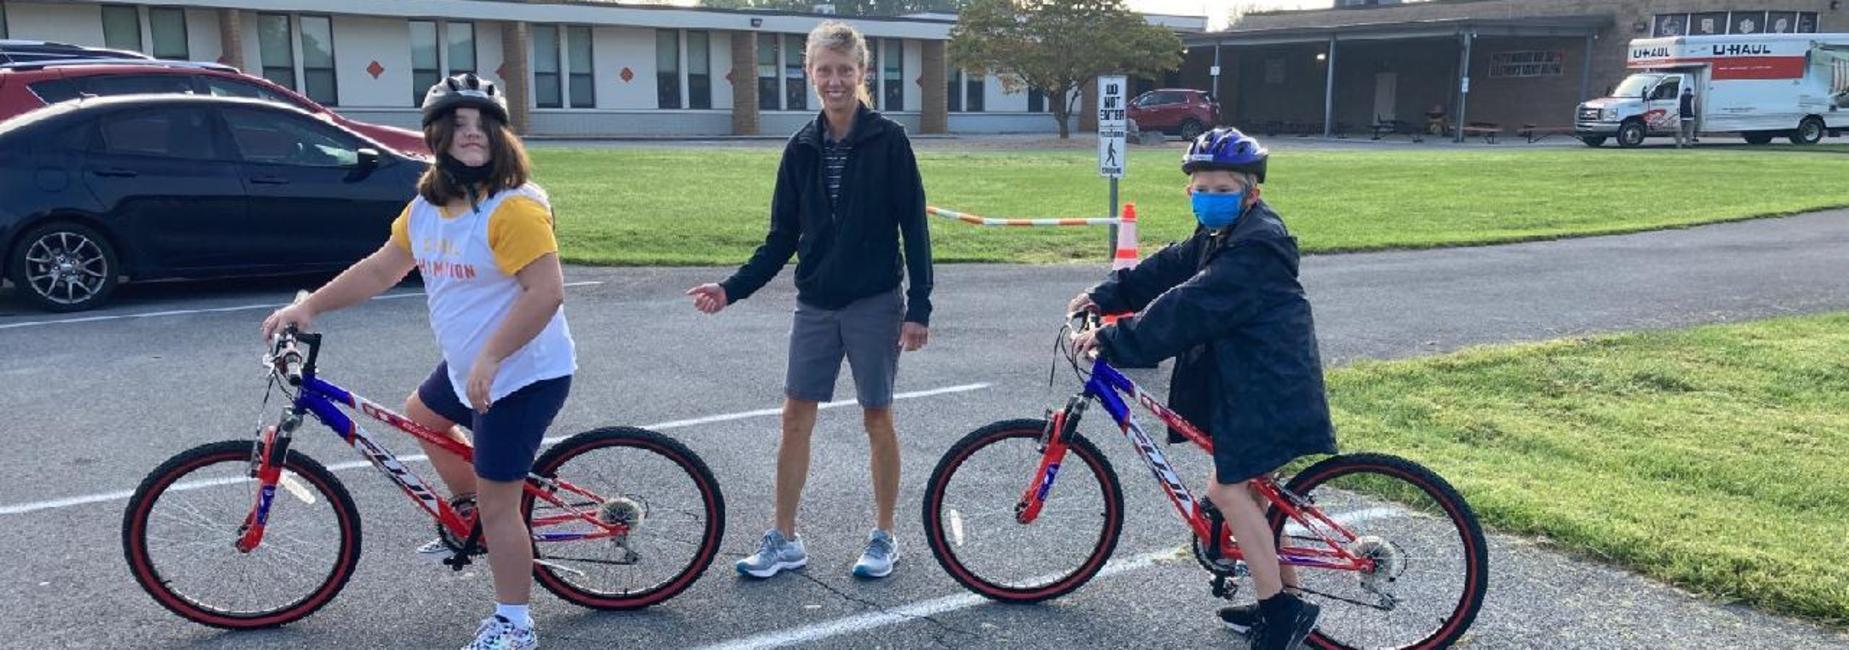 Photo of Mrs. Burchett, PE teacher, and two students riding bikes